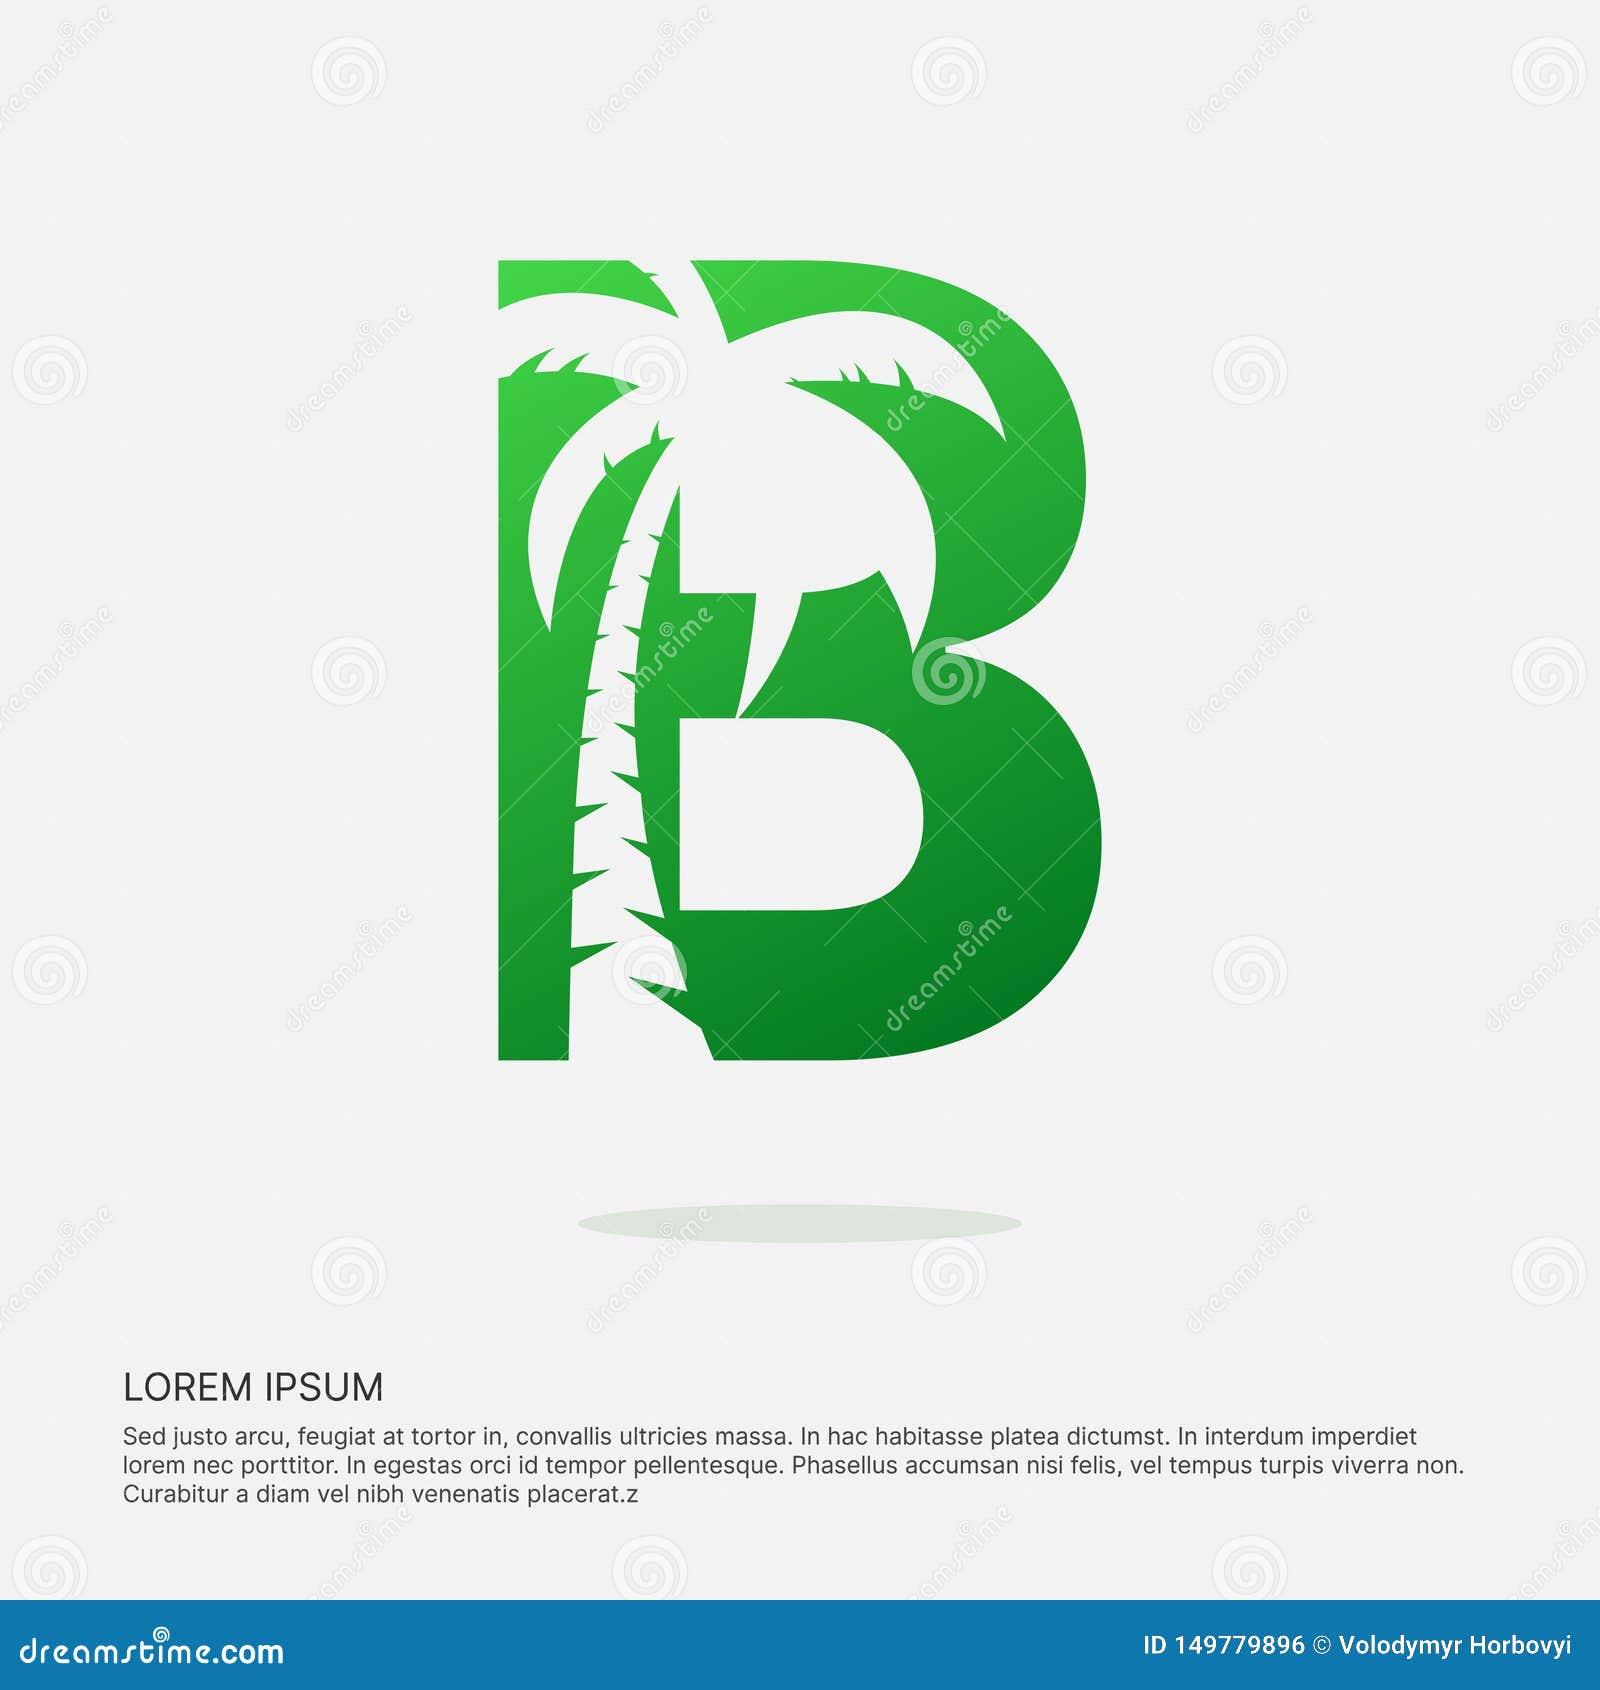 B letter design negative space logotype.